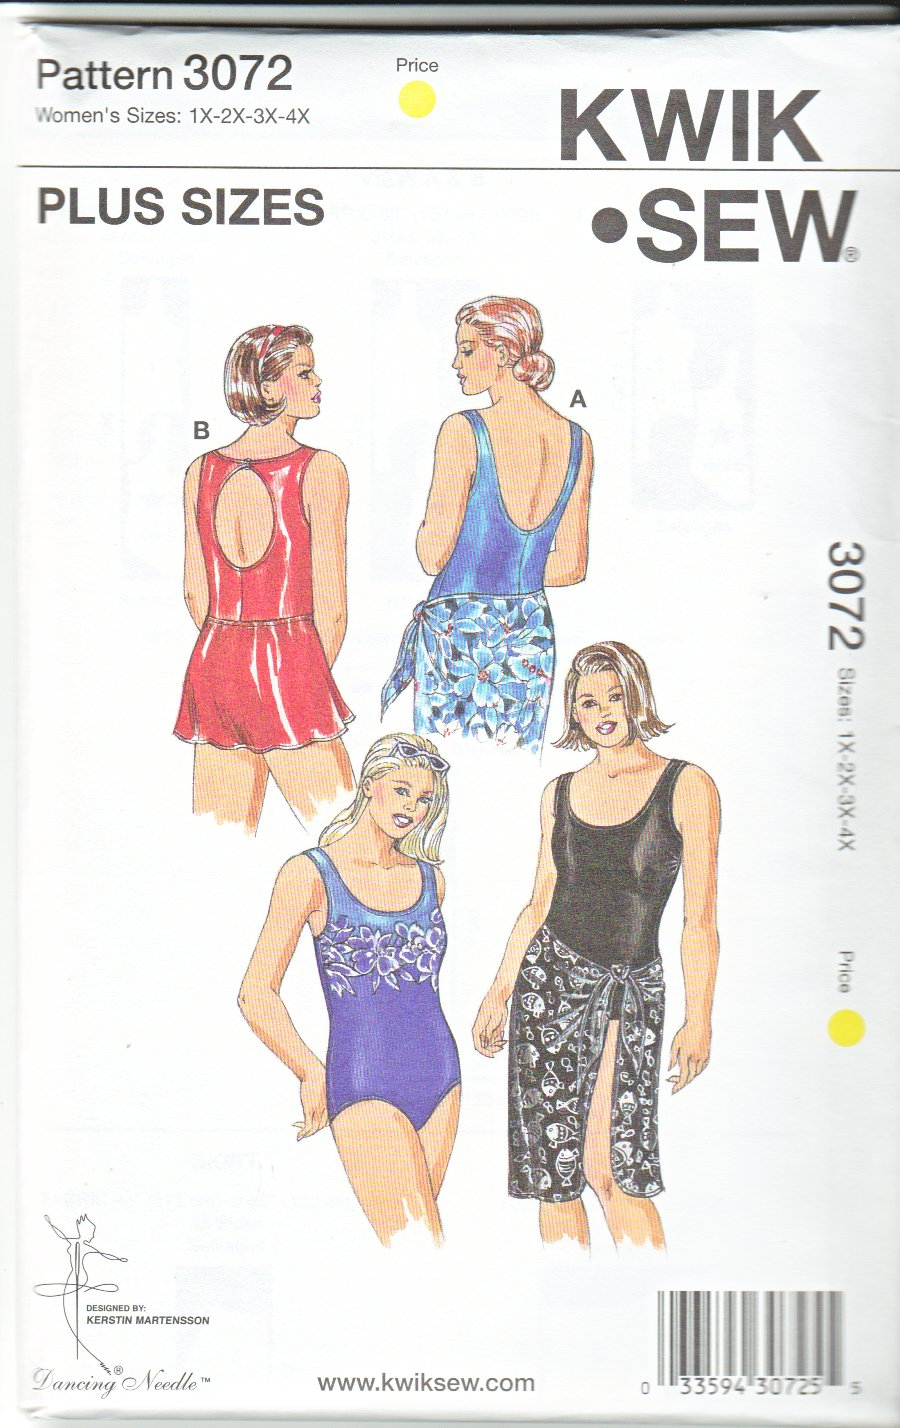 Kwik Sew Sewing Pattern 3072 Women's Plus Size 1X-4X (approx 22W-32W) One Piece Swimsuit Skirt Wrap